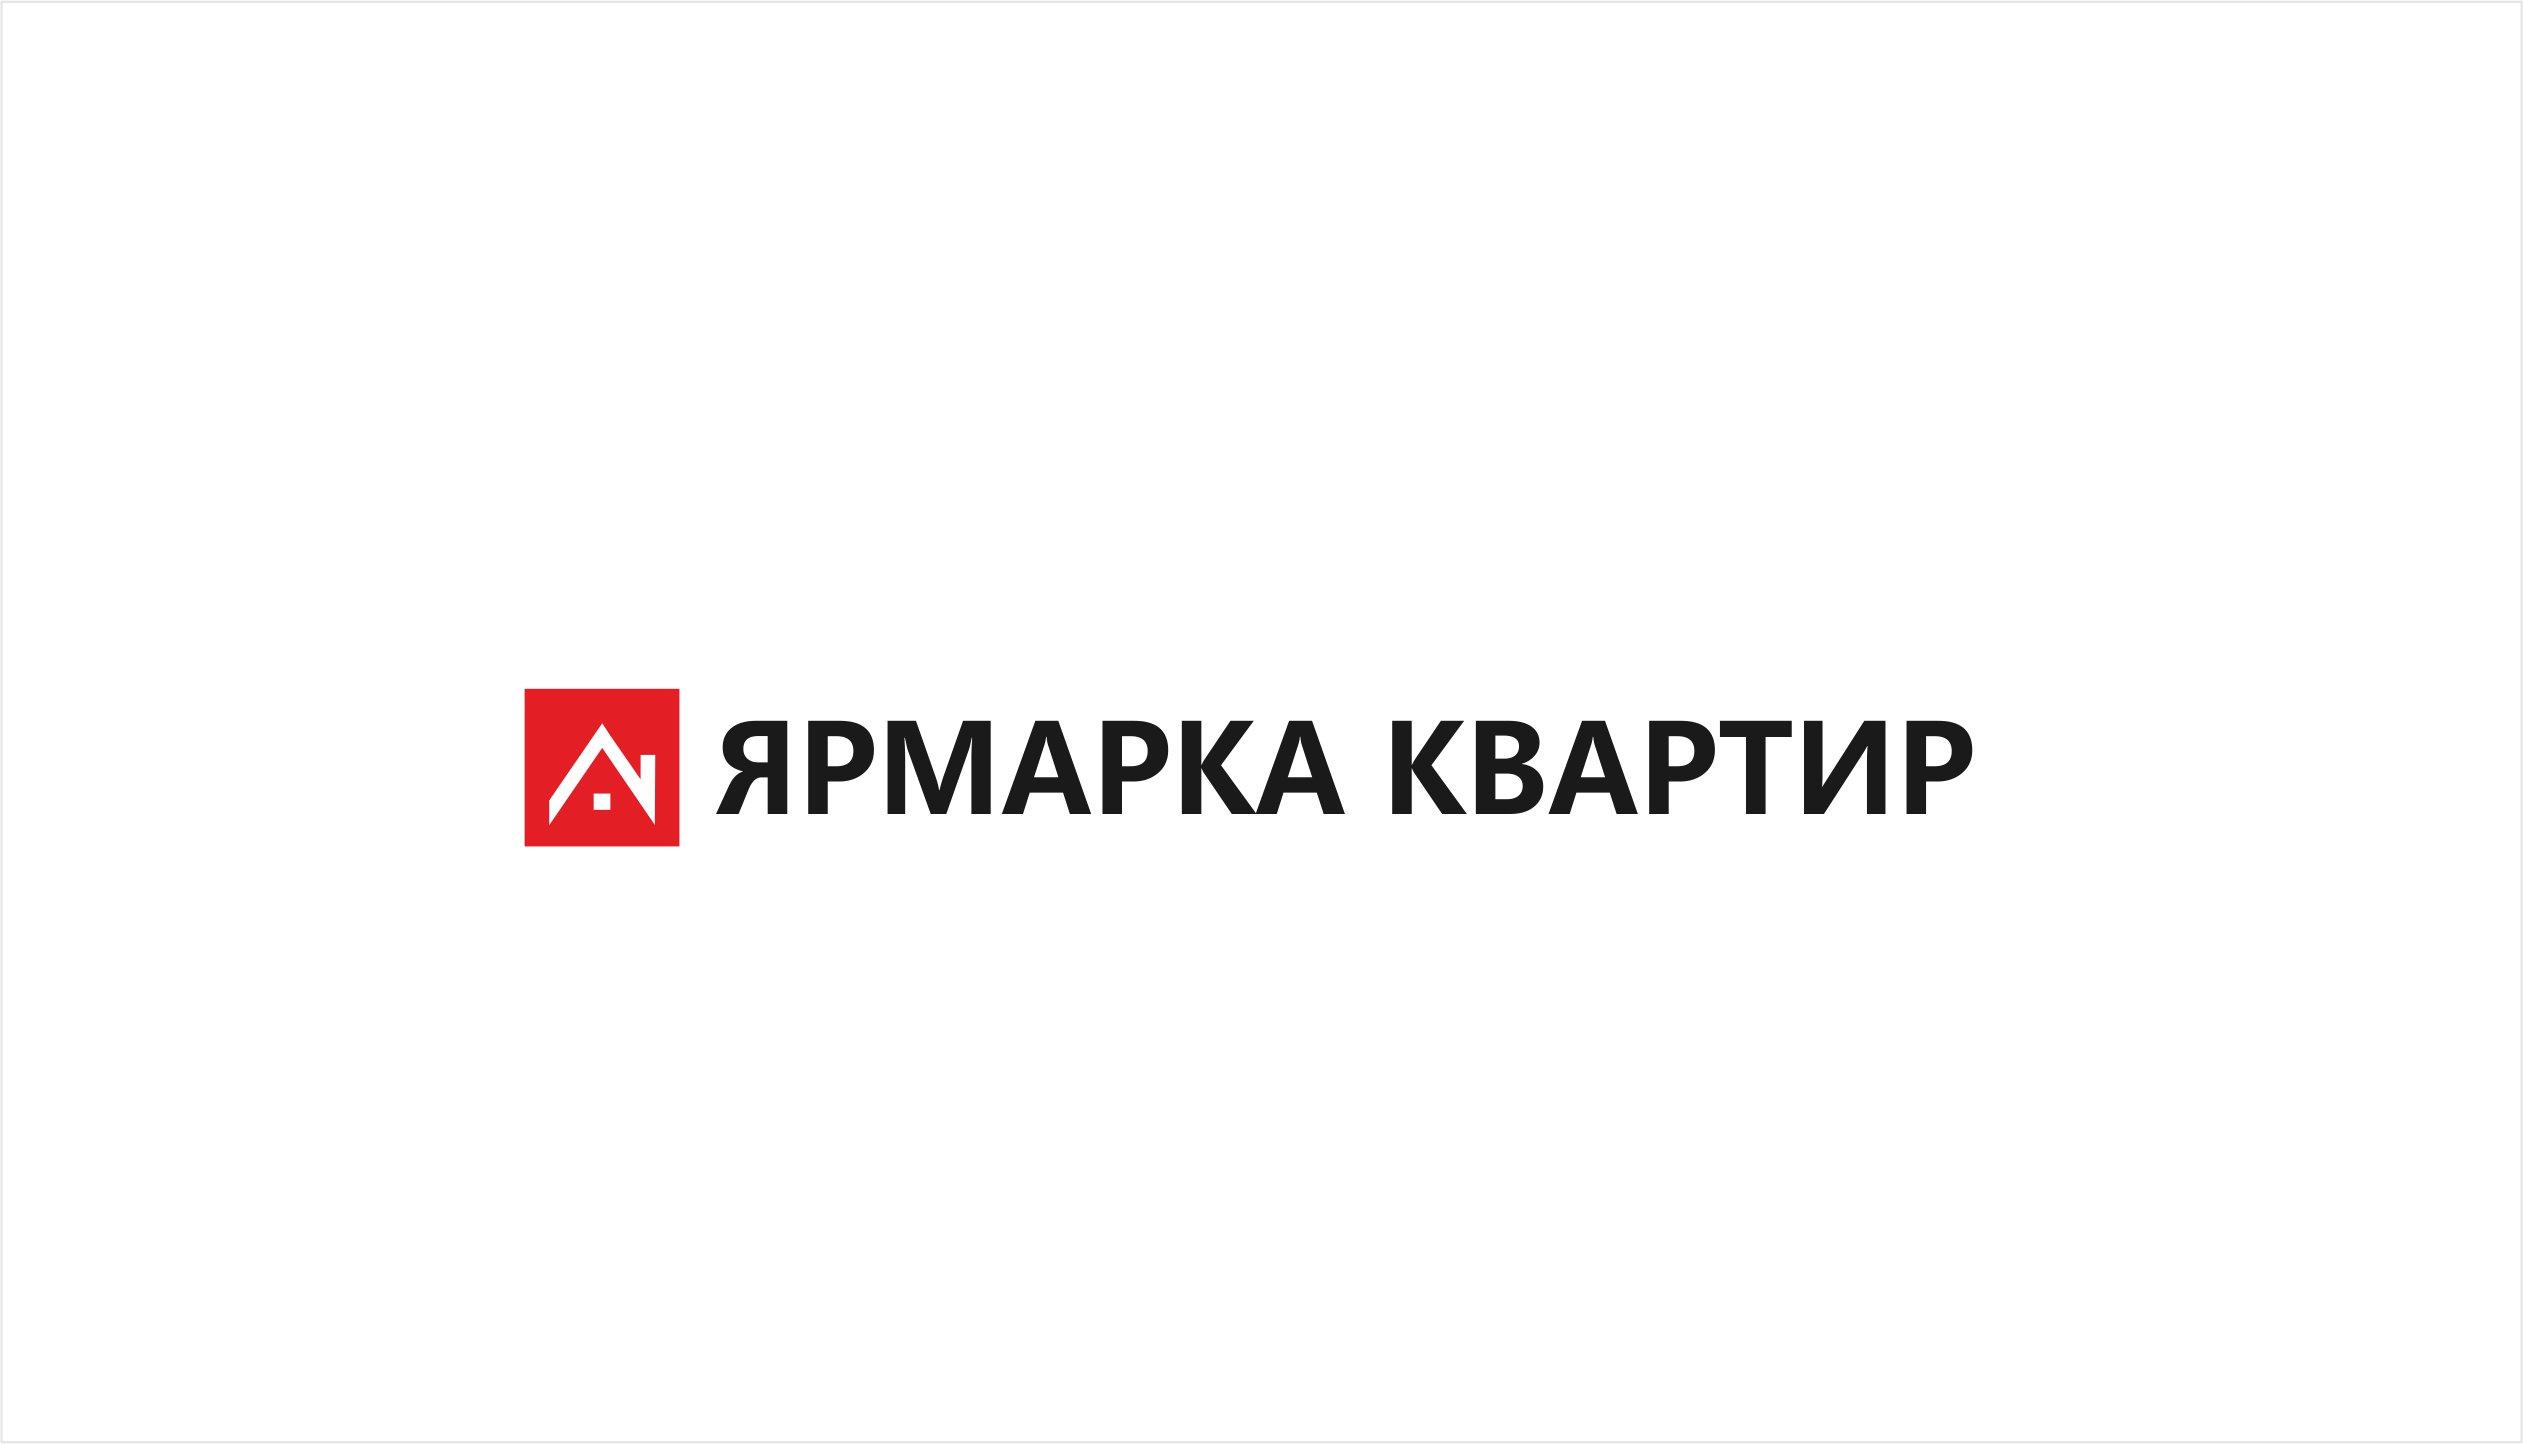 Создание логотипа, с вариантами для визитки и листовки фото f_3886007c2269b35b.jpg